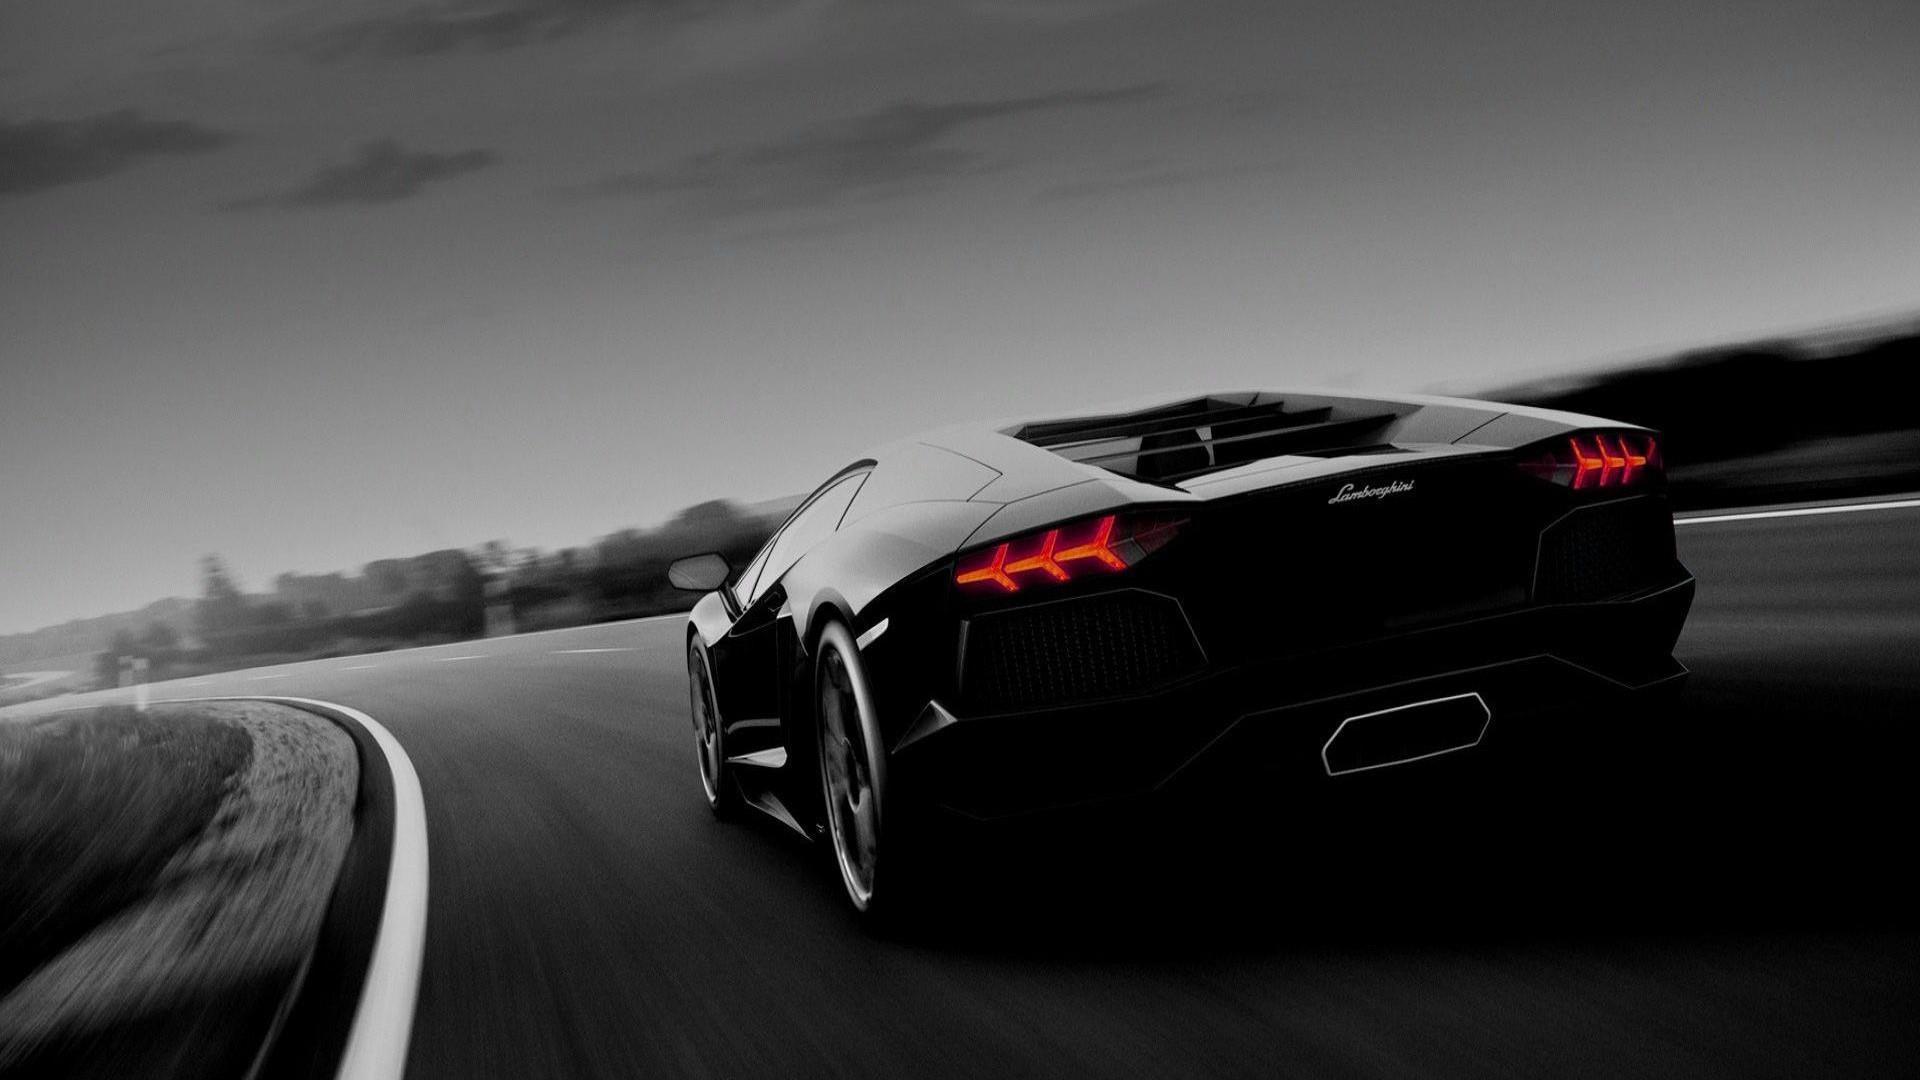 Black Lamborghini Aventador wallpaper